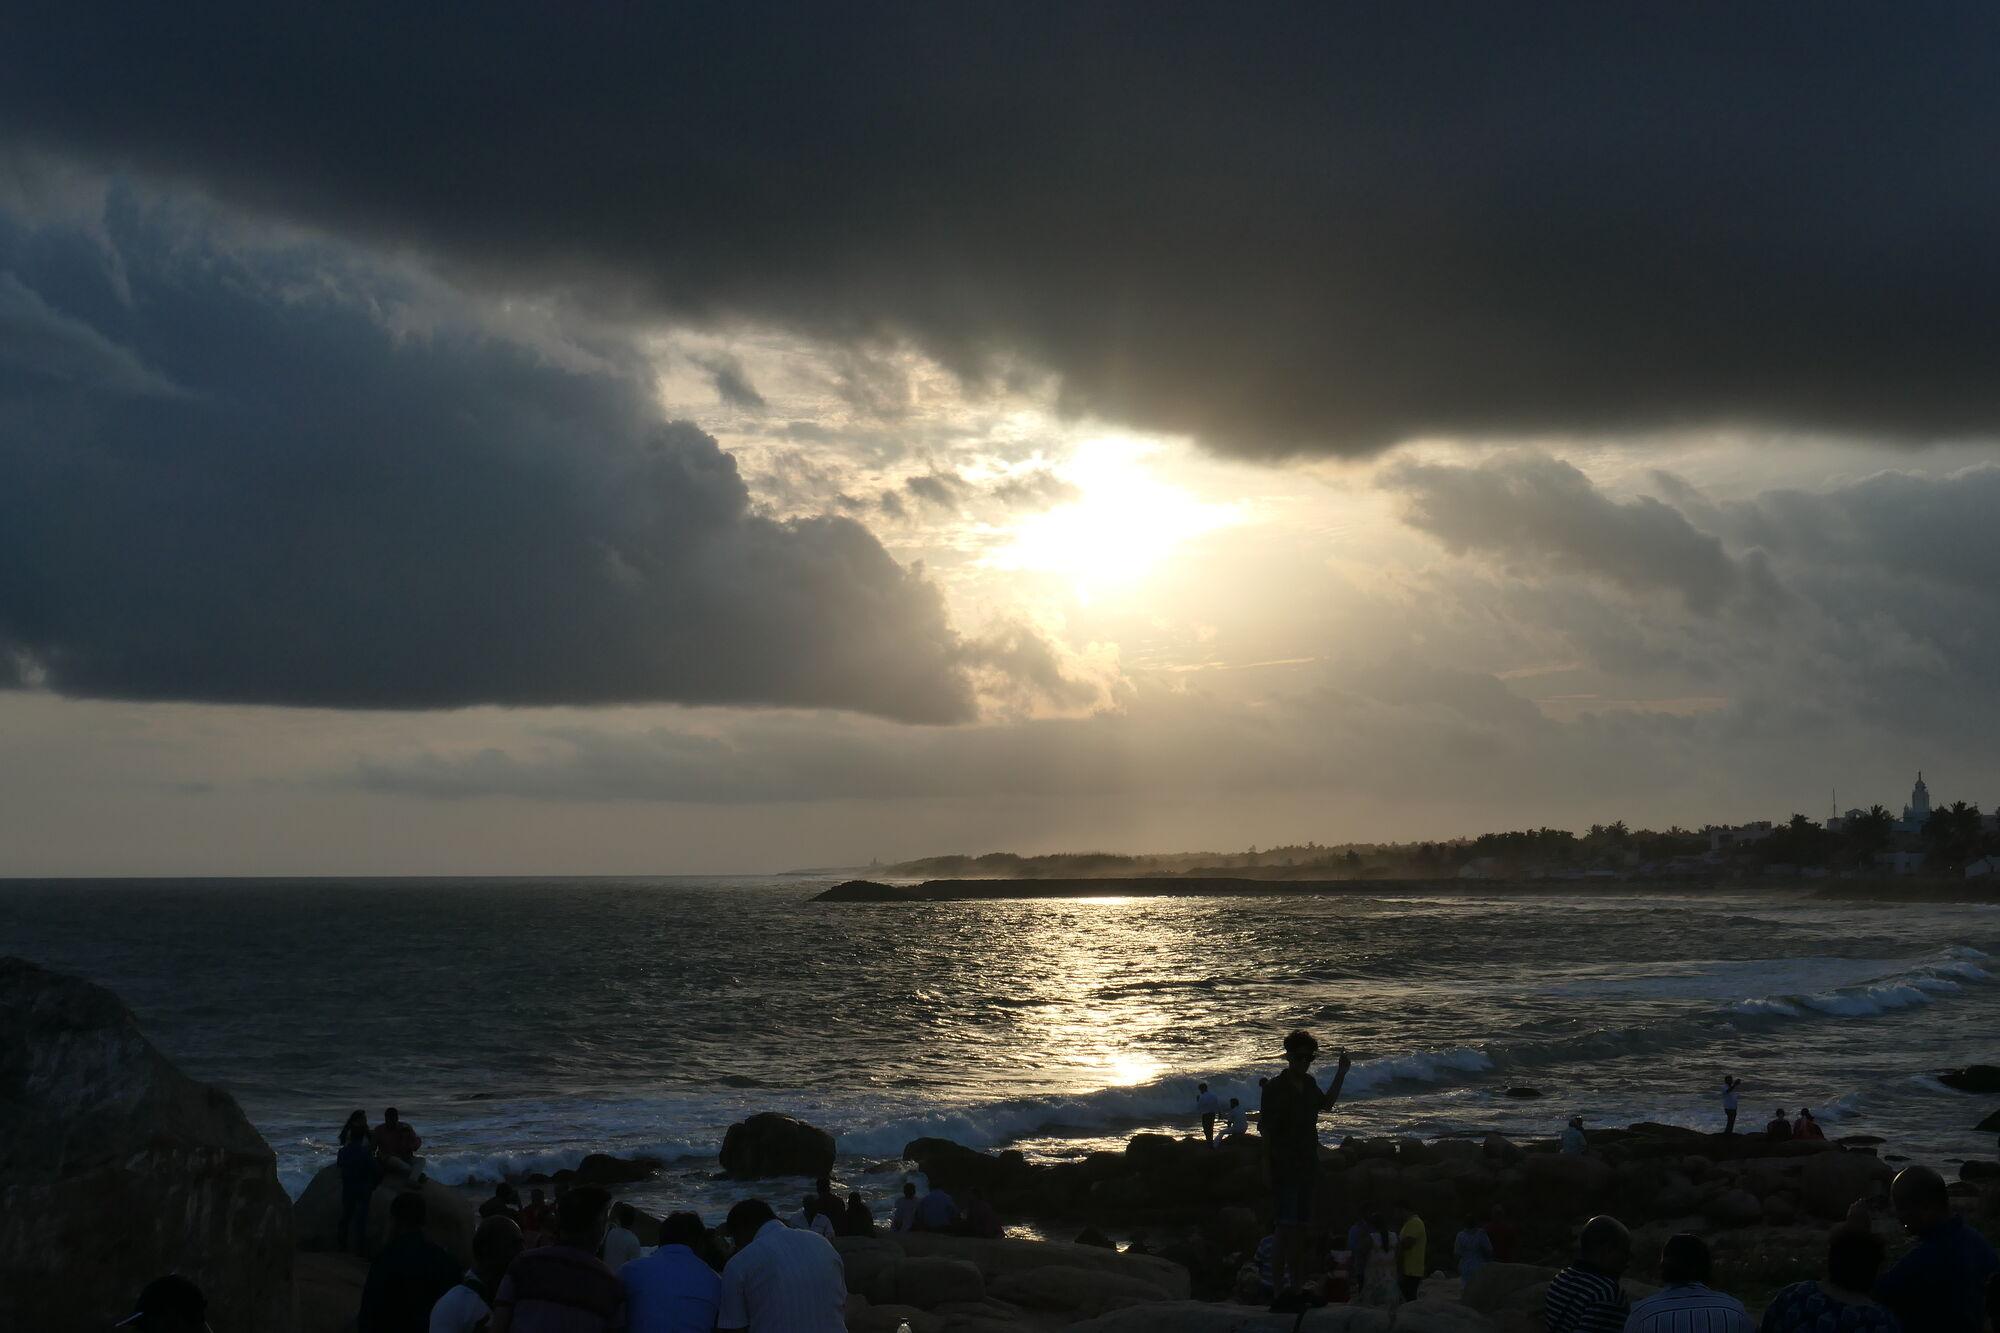 Picture of sunset at Kanyakumari taken with Panasonic Lumix DC-Z200